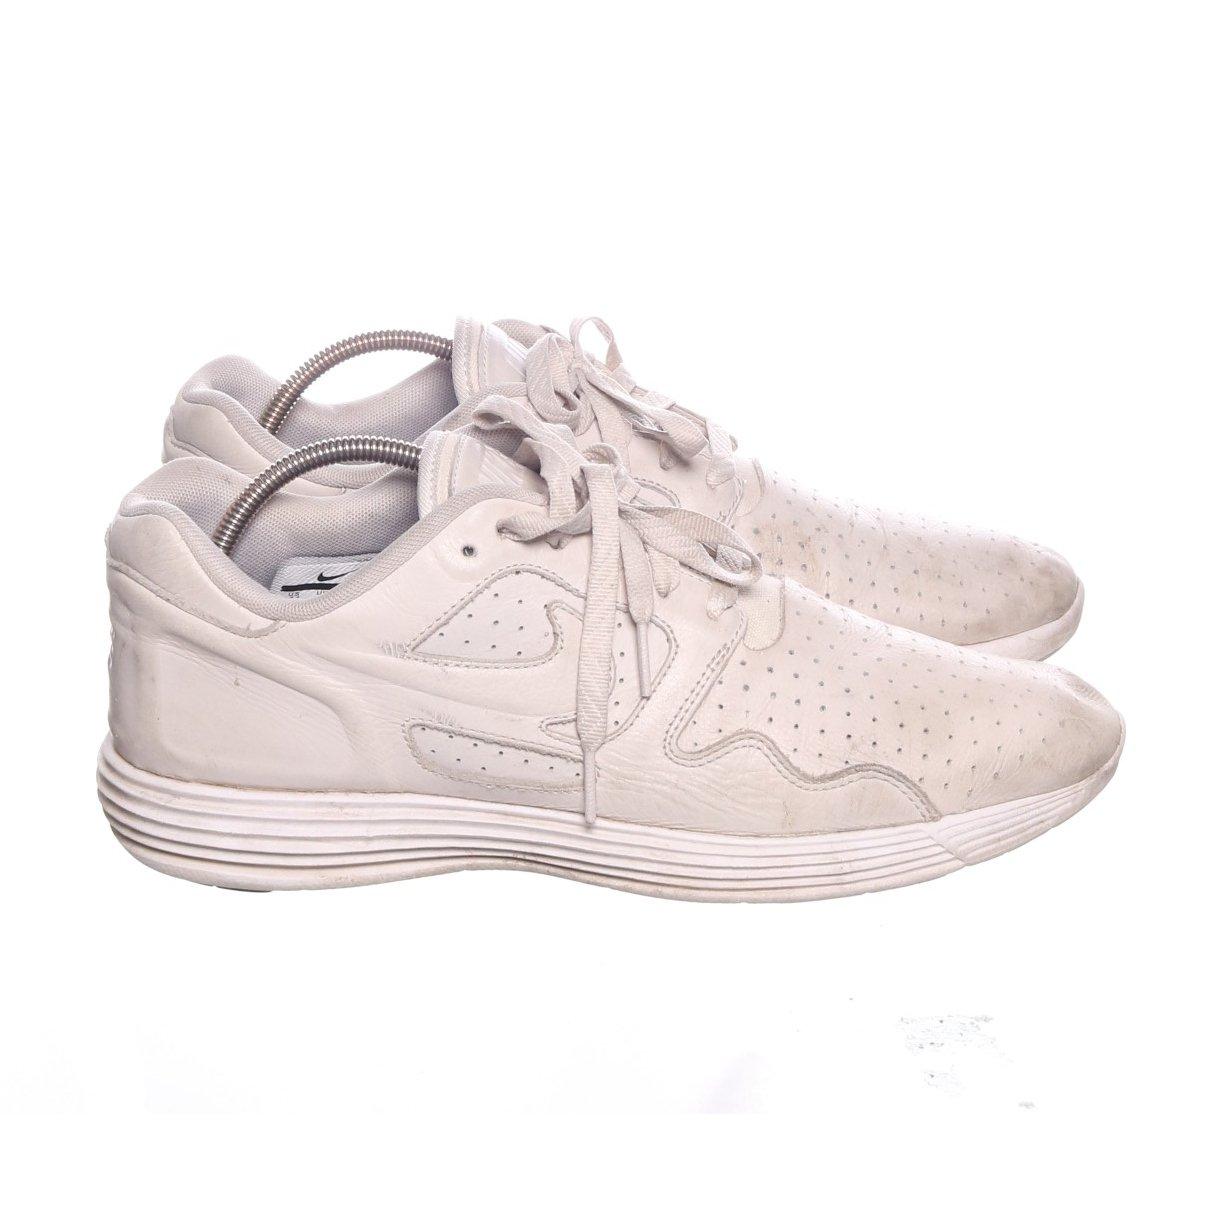 af12f68e529 Nike, Träningsskor, Strl: 45, Vit (352448330) ᐈ Sellpy på Tradera